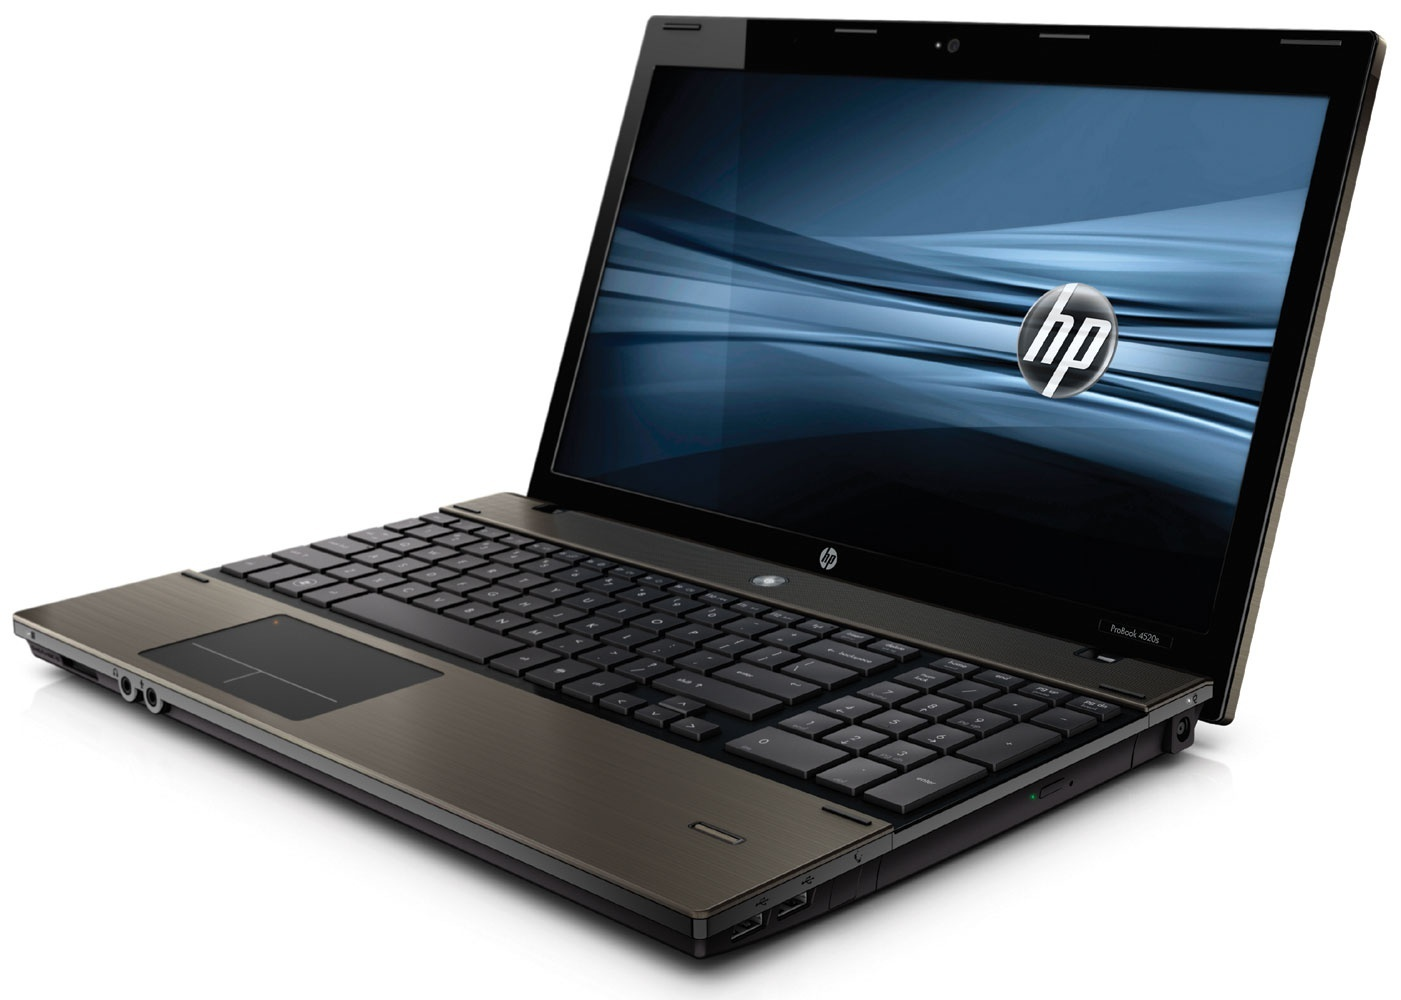 HP Probook 4720S | CORE I3 | 4 GB | Windows 10